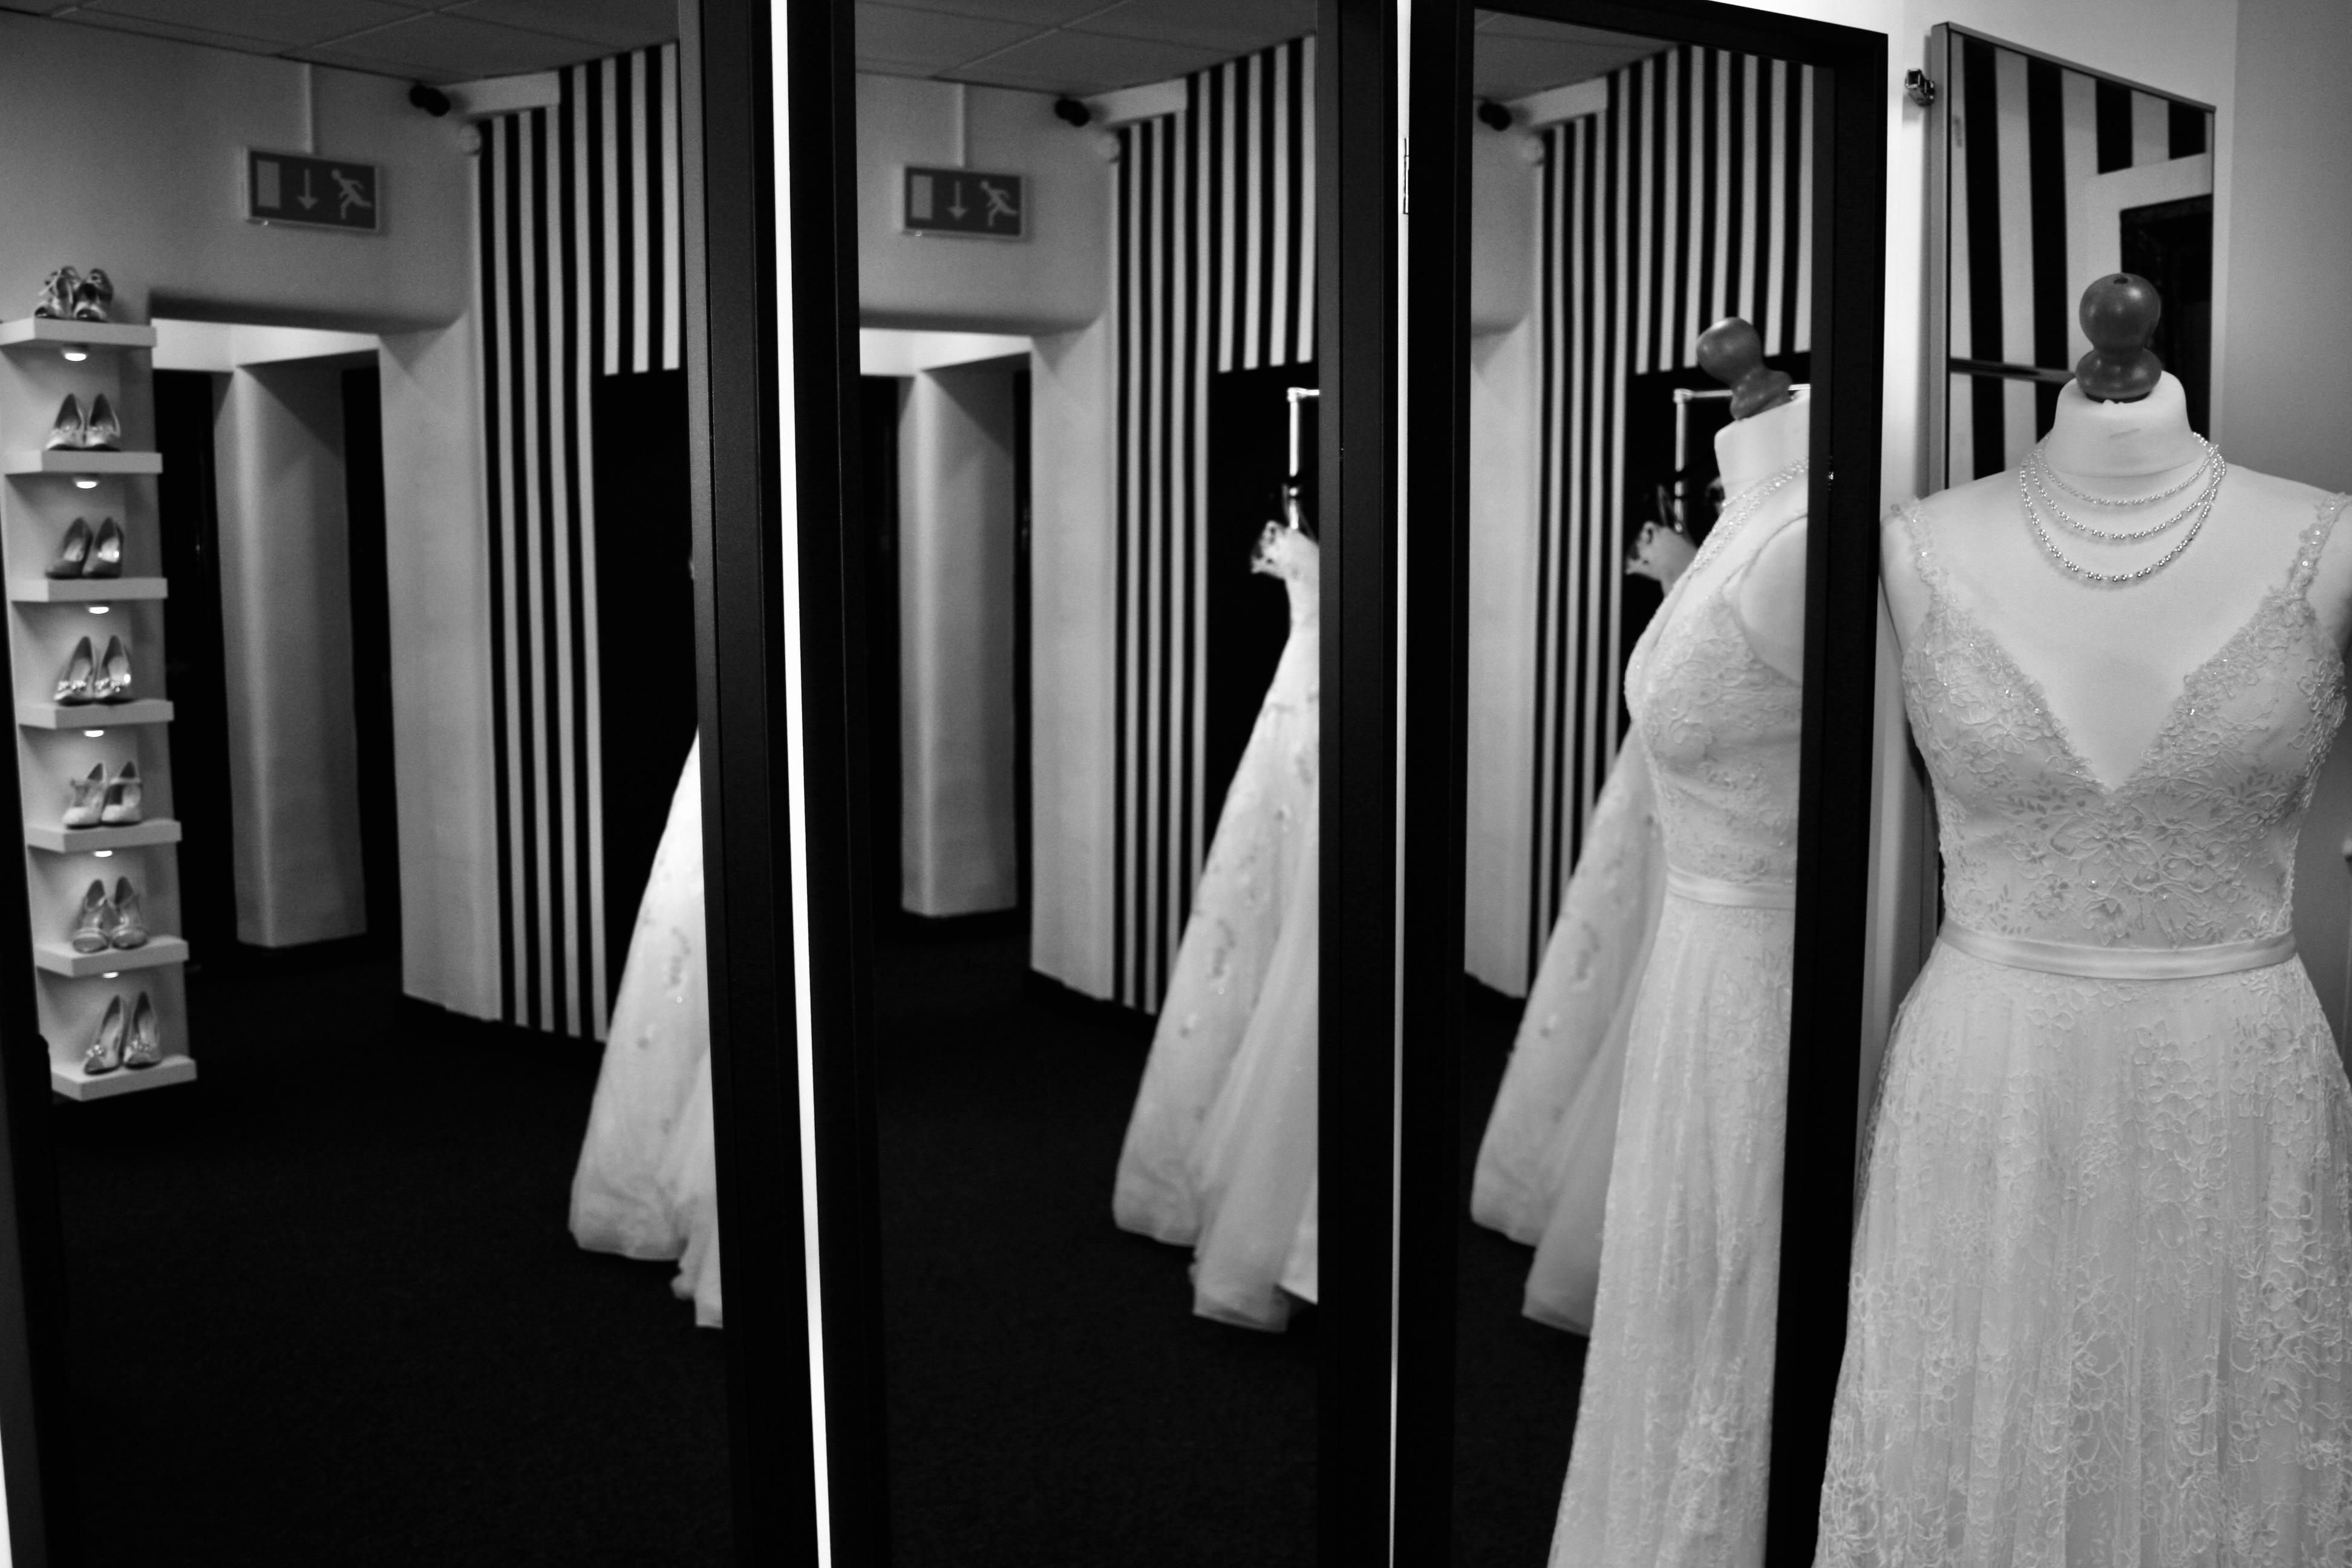 Premium Bridal   Willow Bridal   Couture Bridal Cheshire